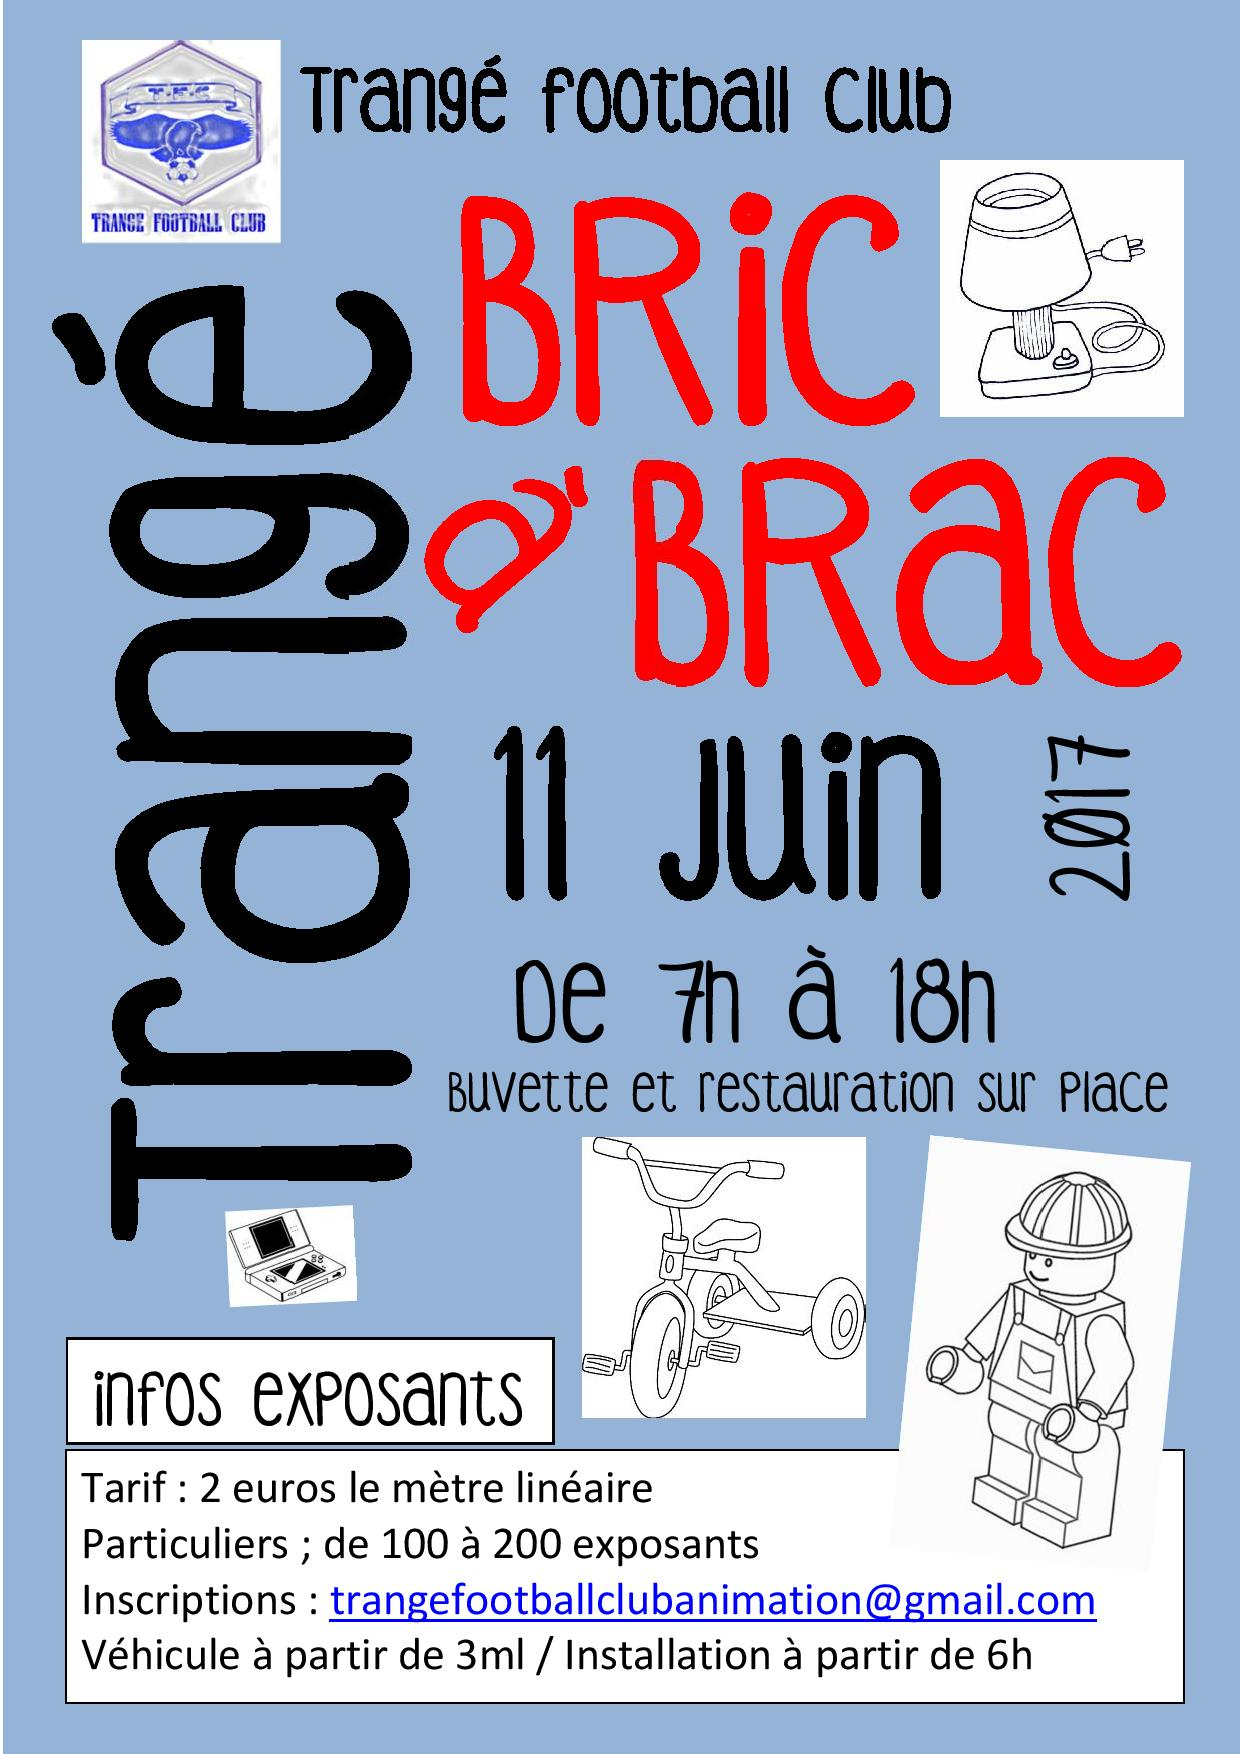 BRIC A BRAC TRANGE 2017